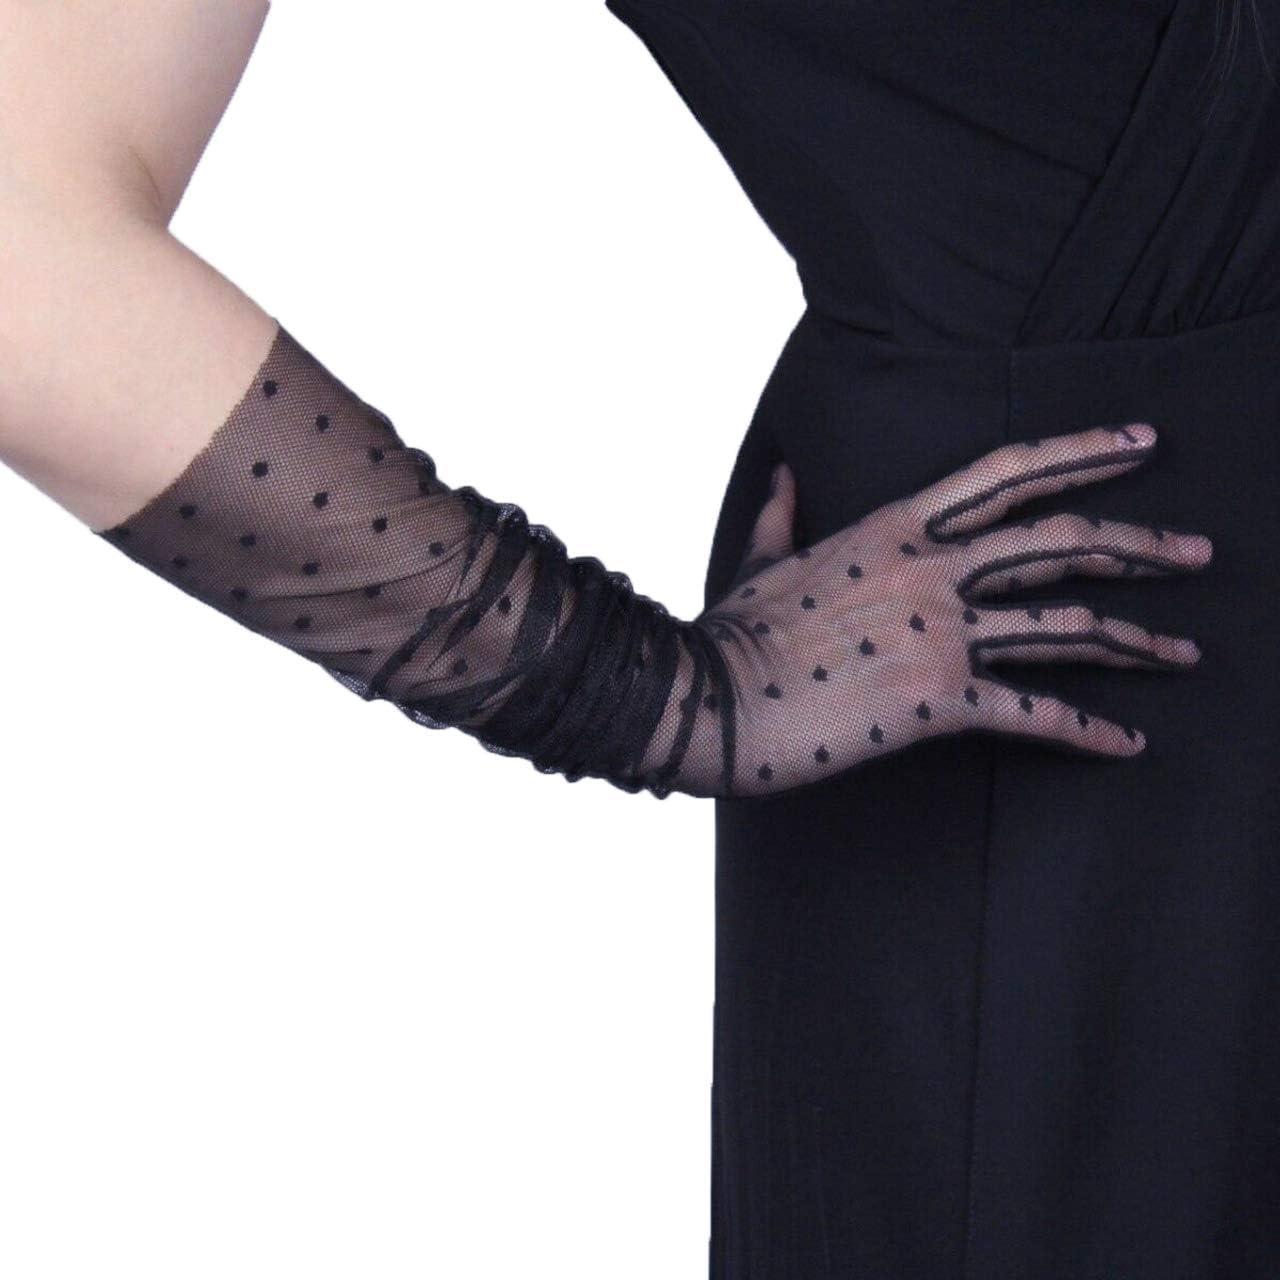 Polka Dot Lace Gloves Stretch Tulle Nylon Black Semi Sheer Short Touchscreen